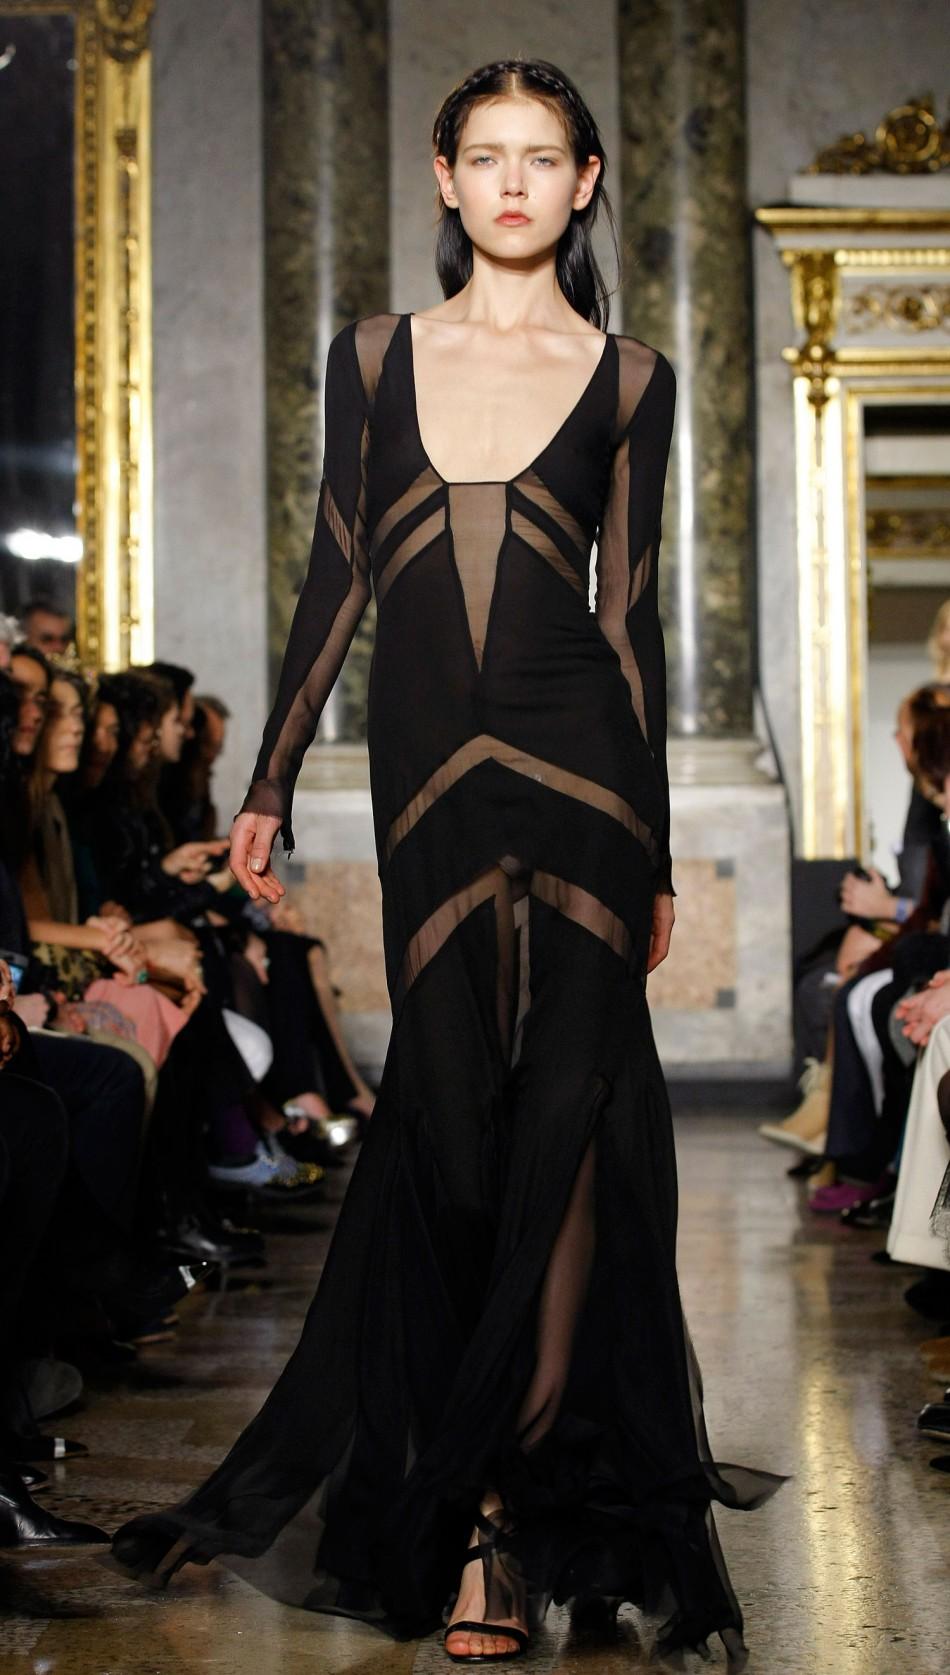 Milan Fashion Week Highlight Emilio Puccis Striking Androgynous Collection